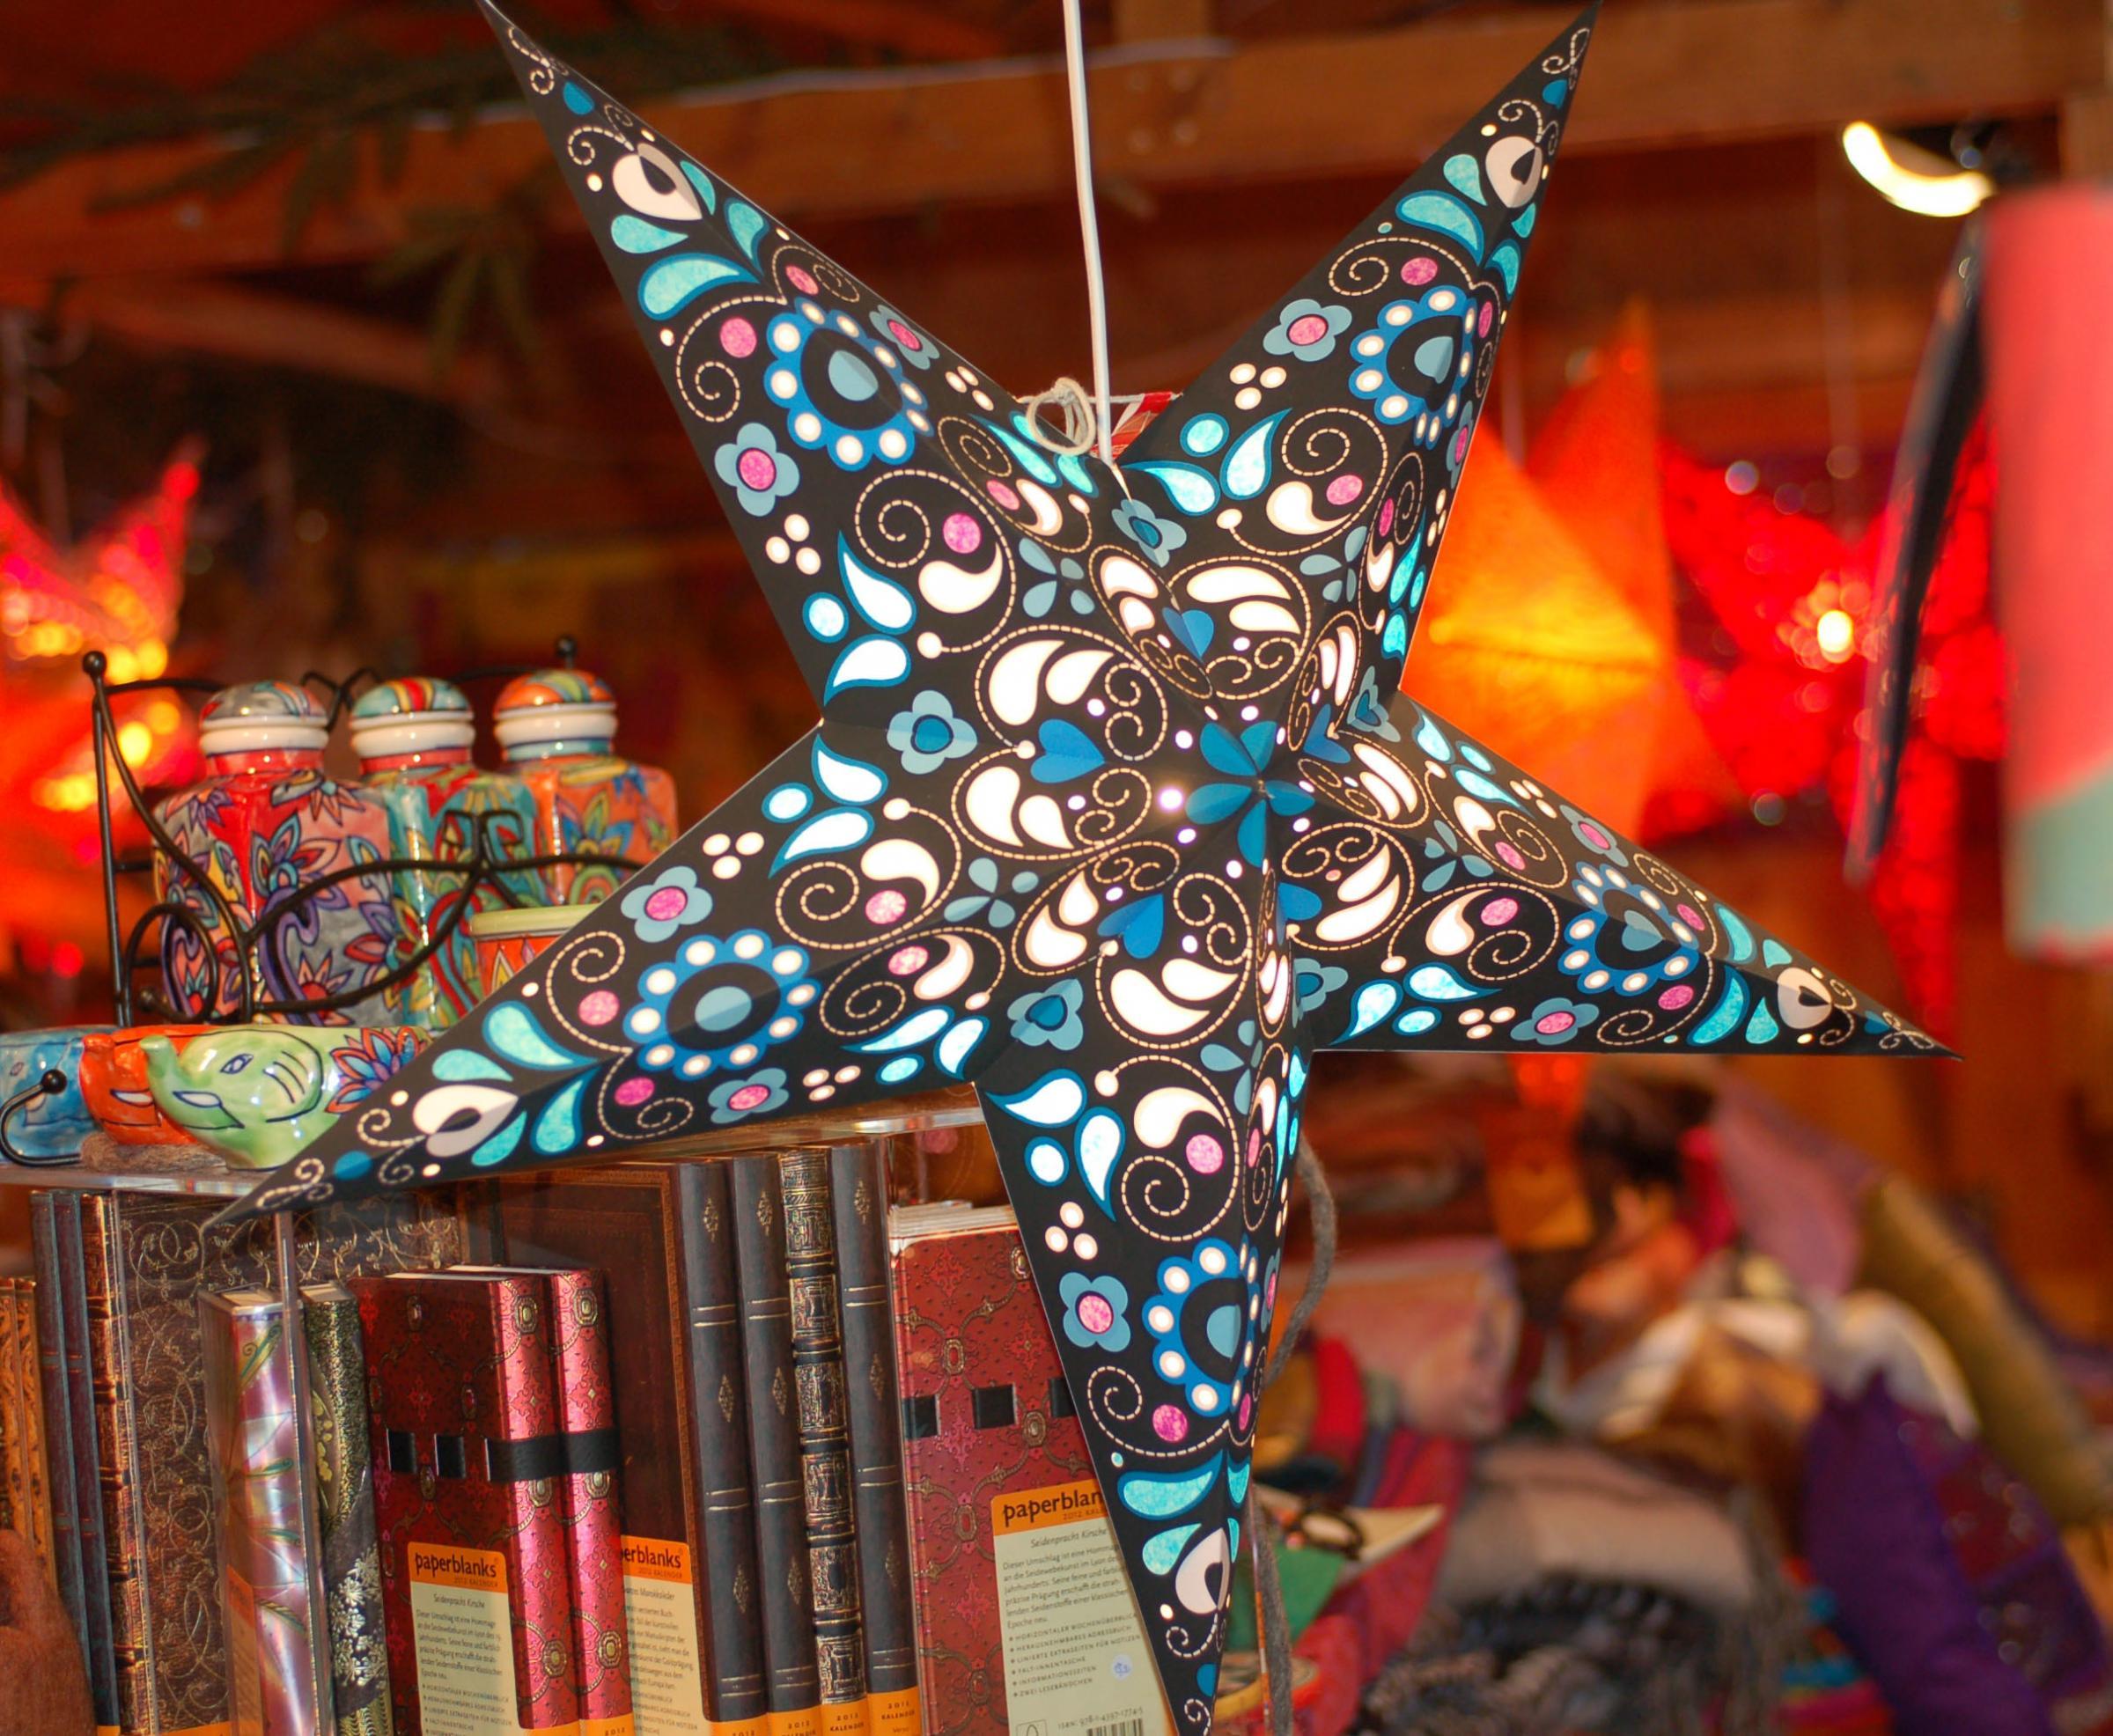 Lyneham gets Christmas craft fair